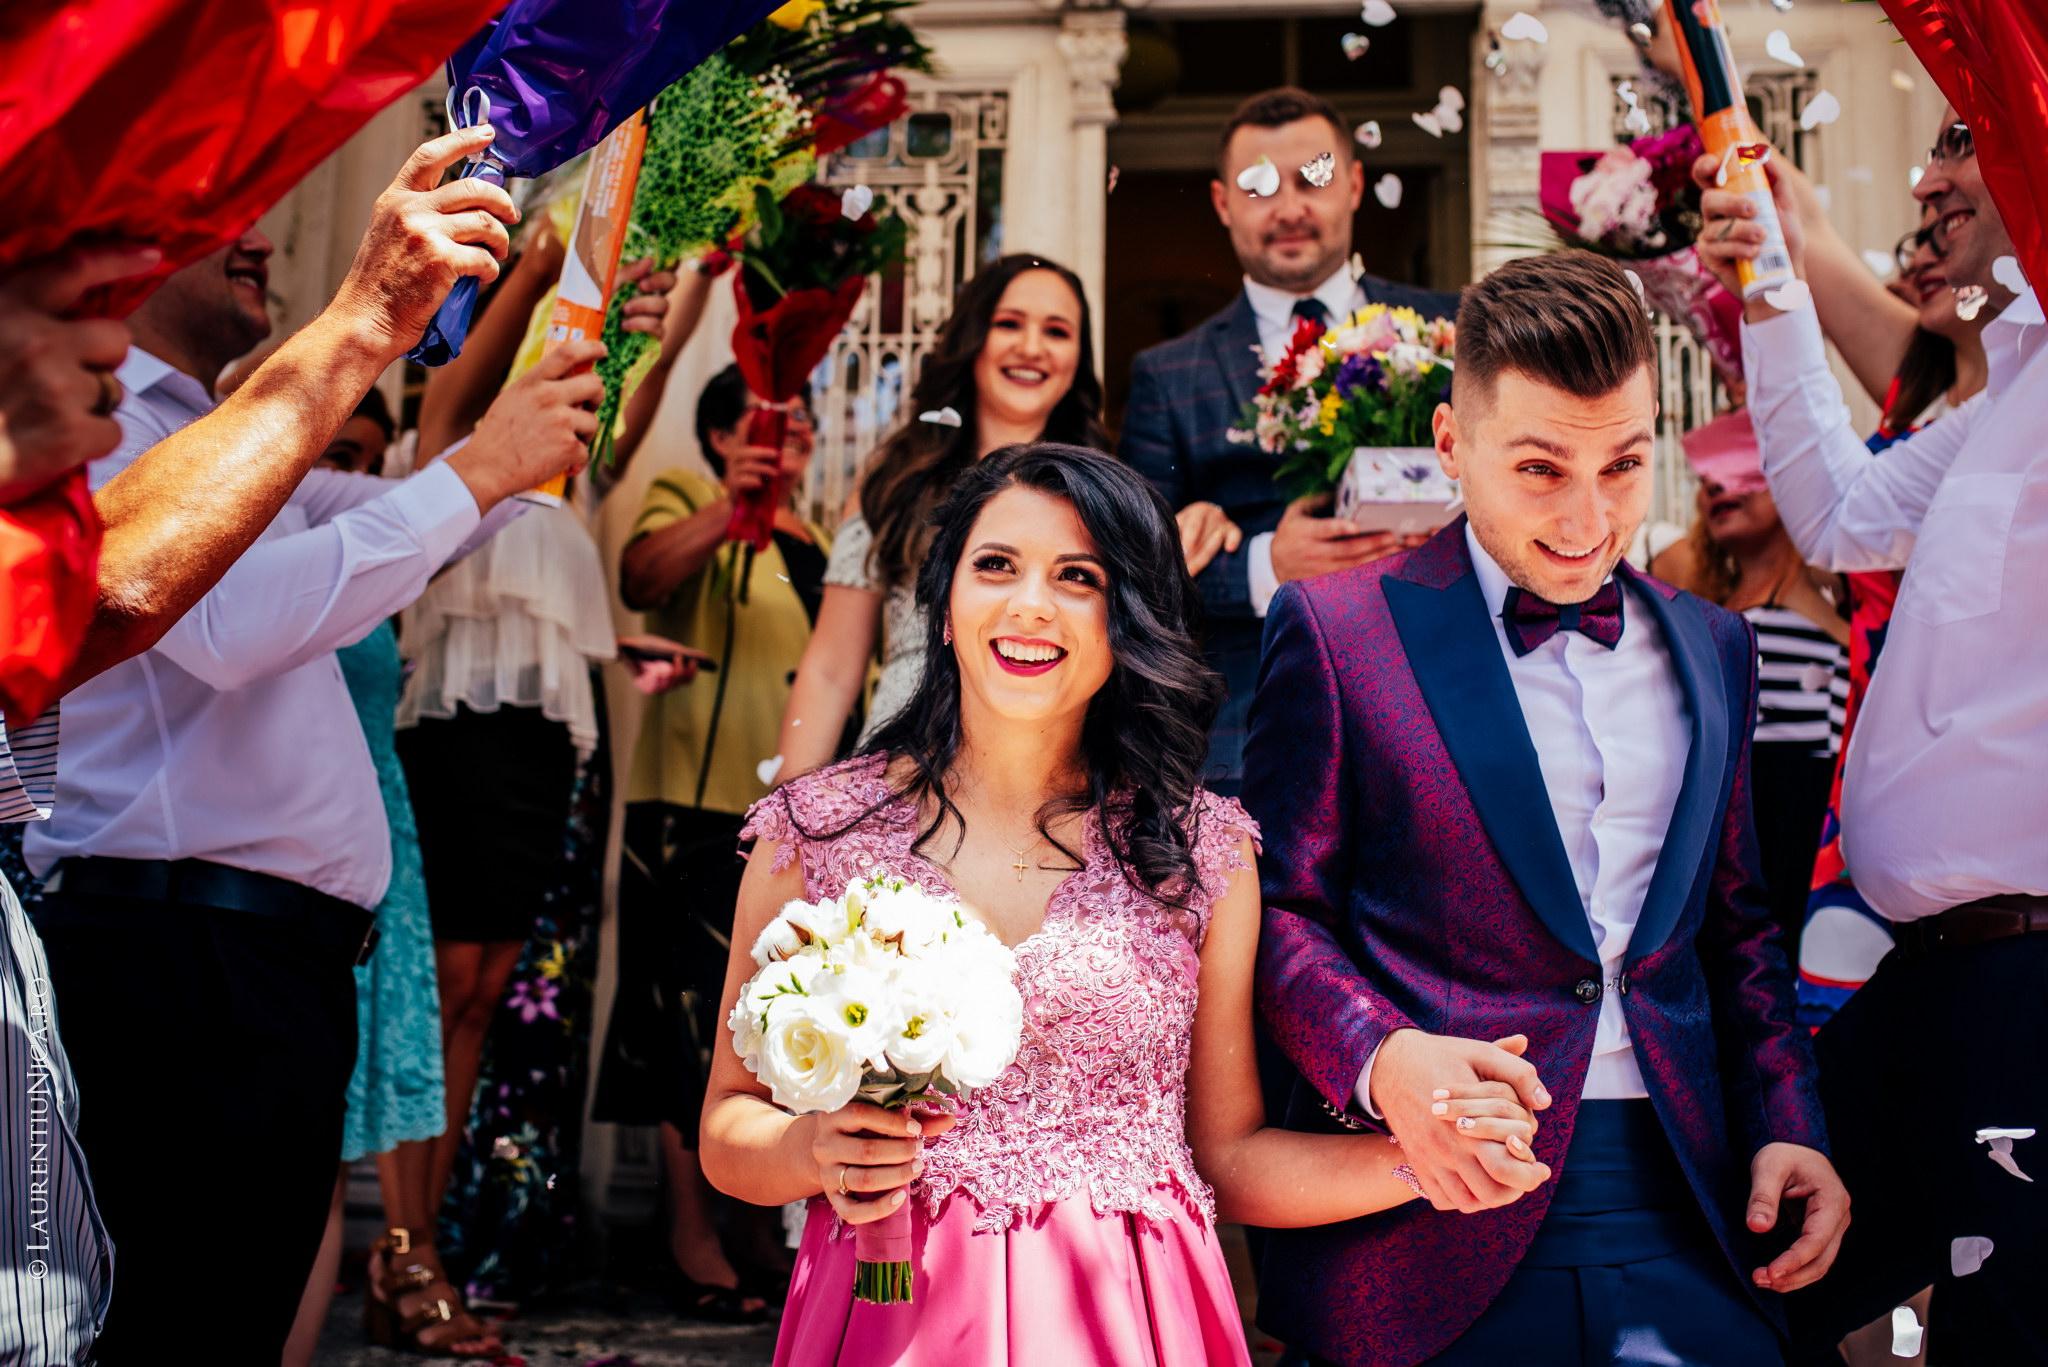 fotografii nunta craiova bia alex fotograf nunta laurentiu nica 01 - Bia & Alex | Fotografii nunta | Craiova